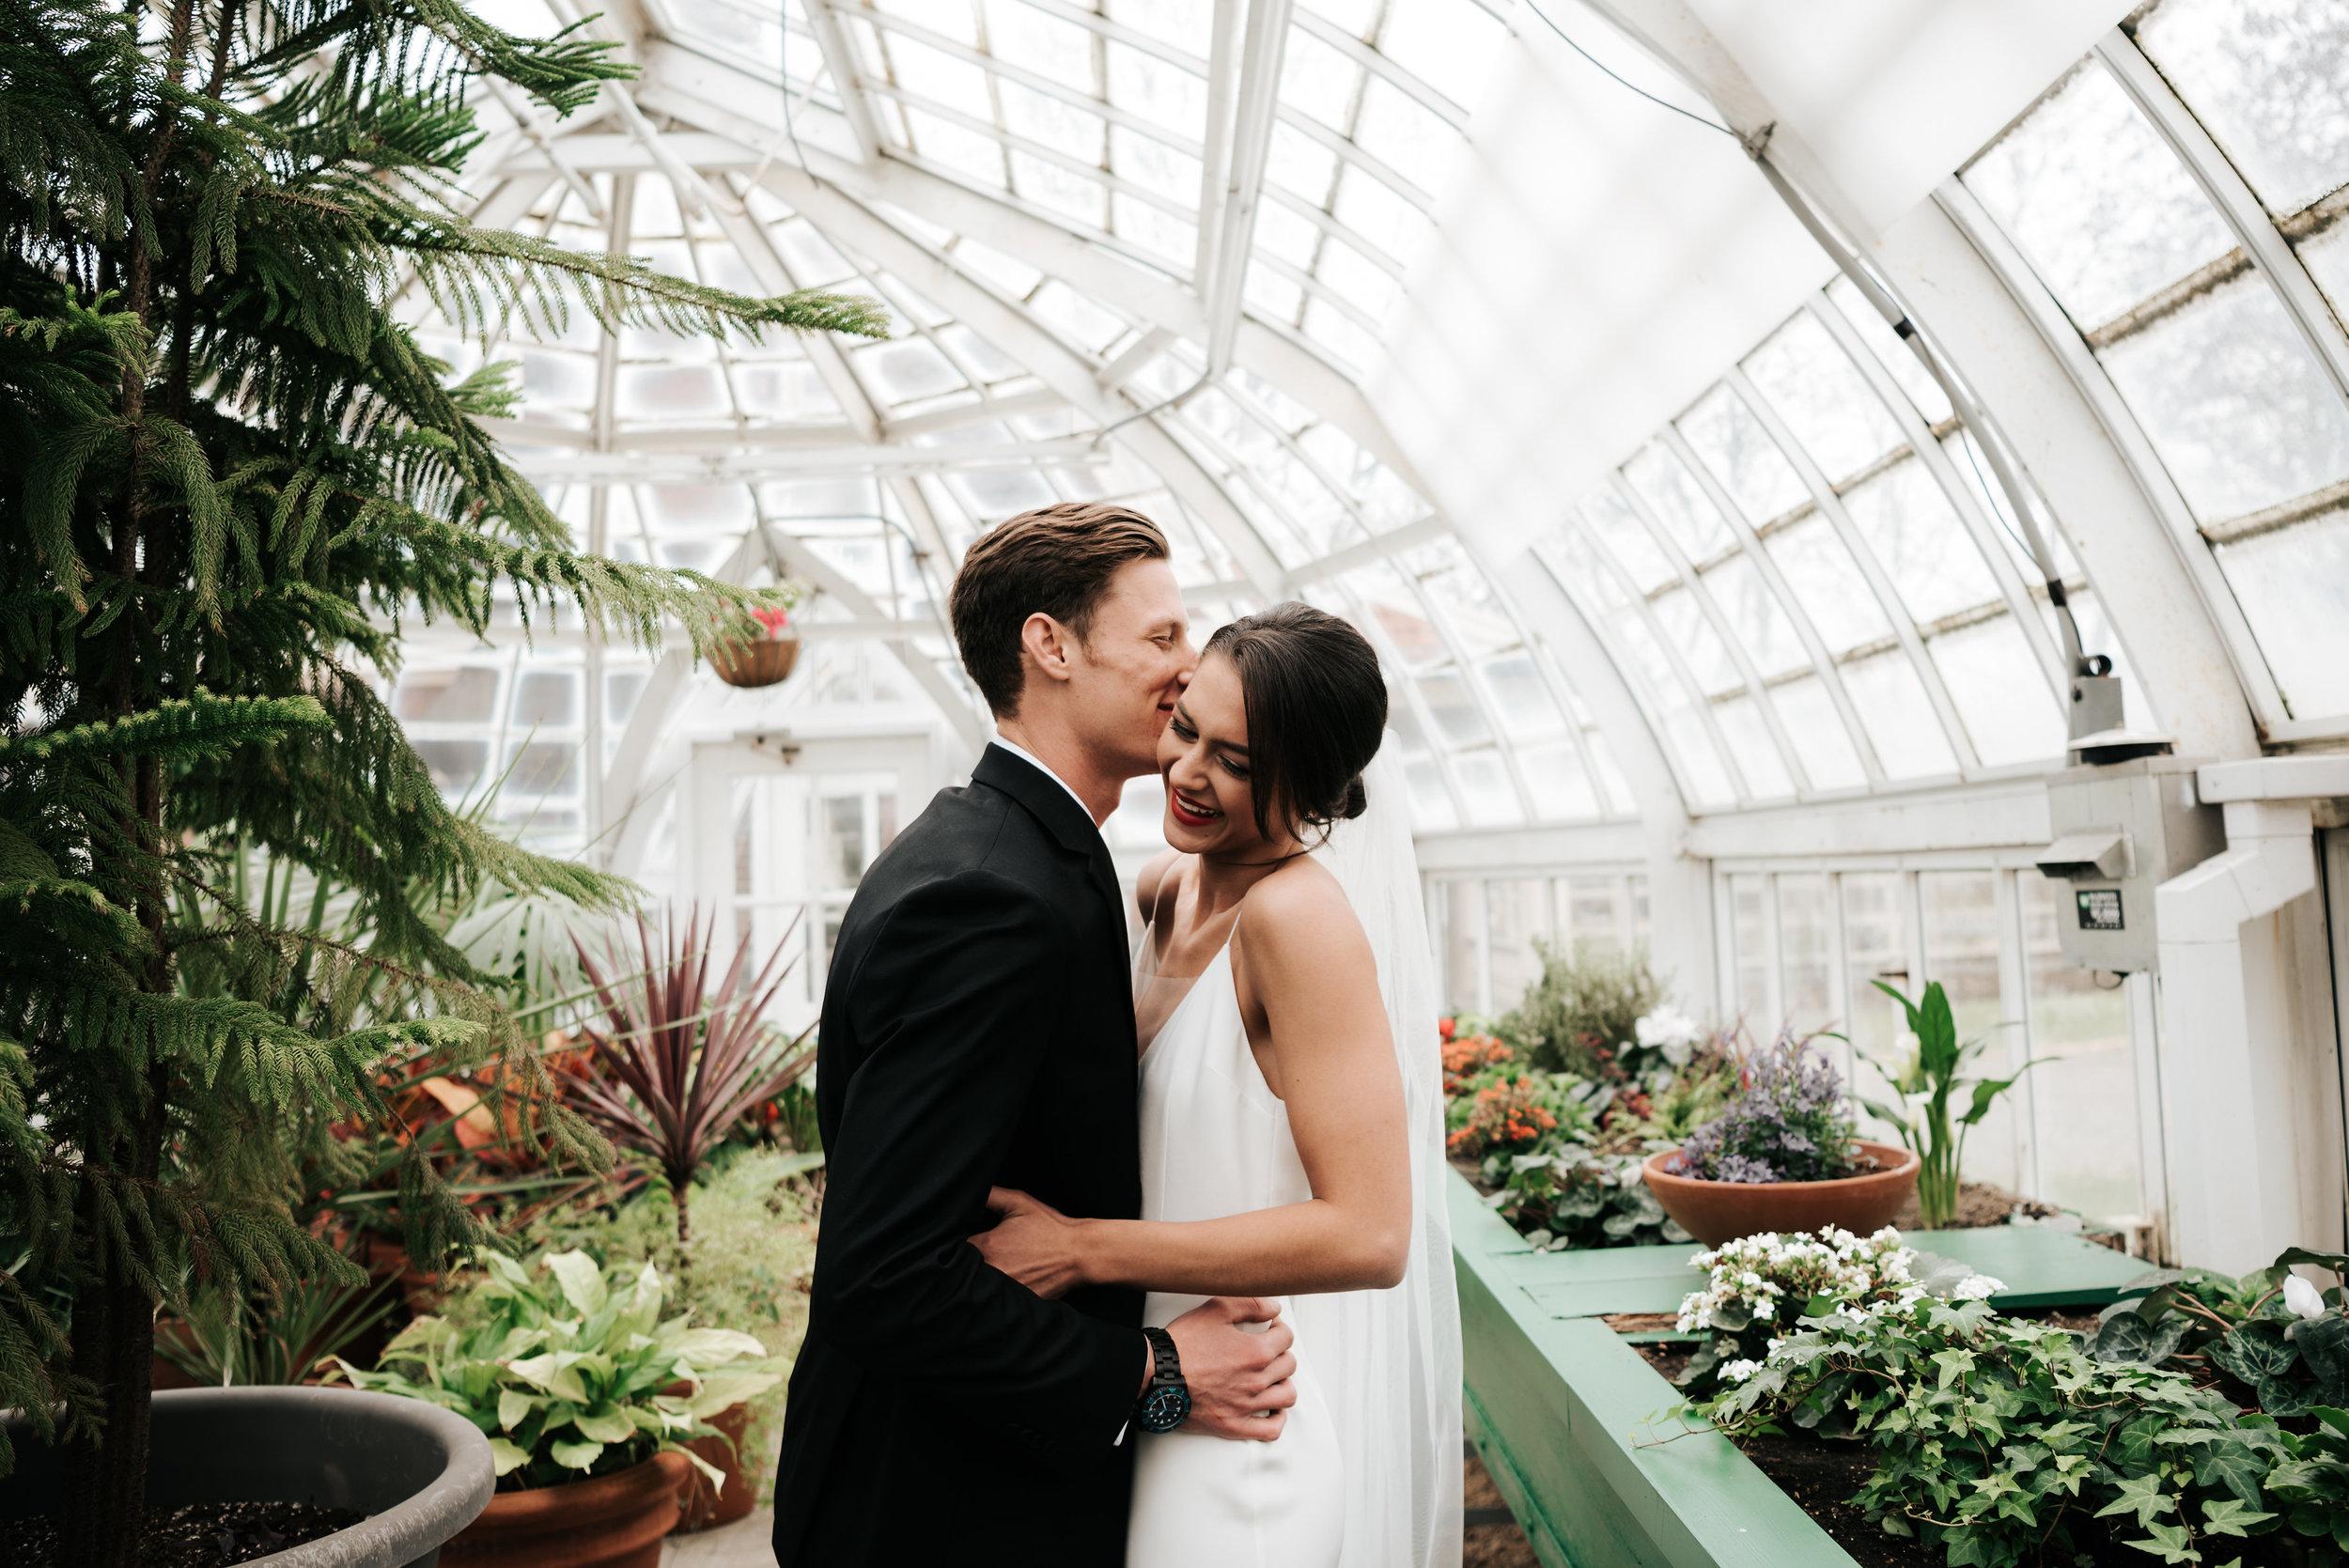 Pittsburgh-Mattress-Factory-Wedding-189.jpg